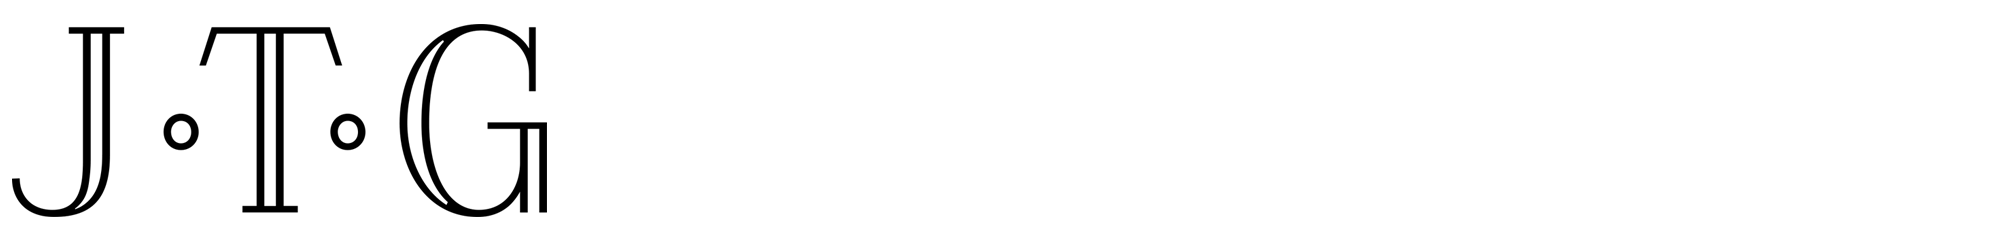 JTG_Logo_contact.png